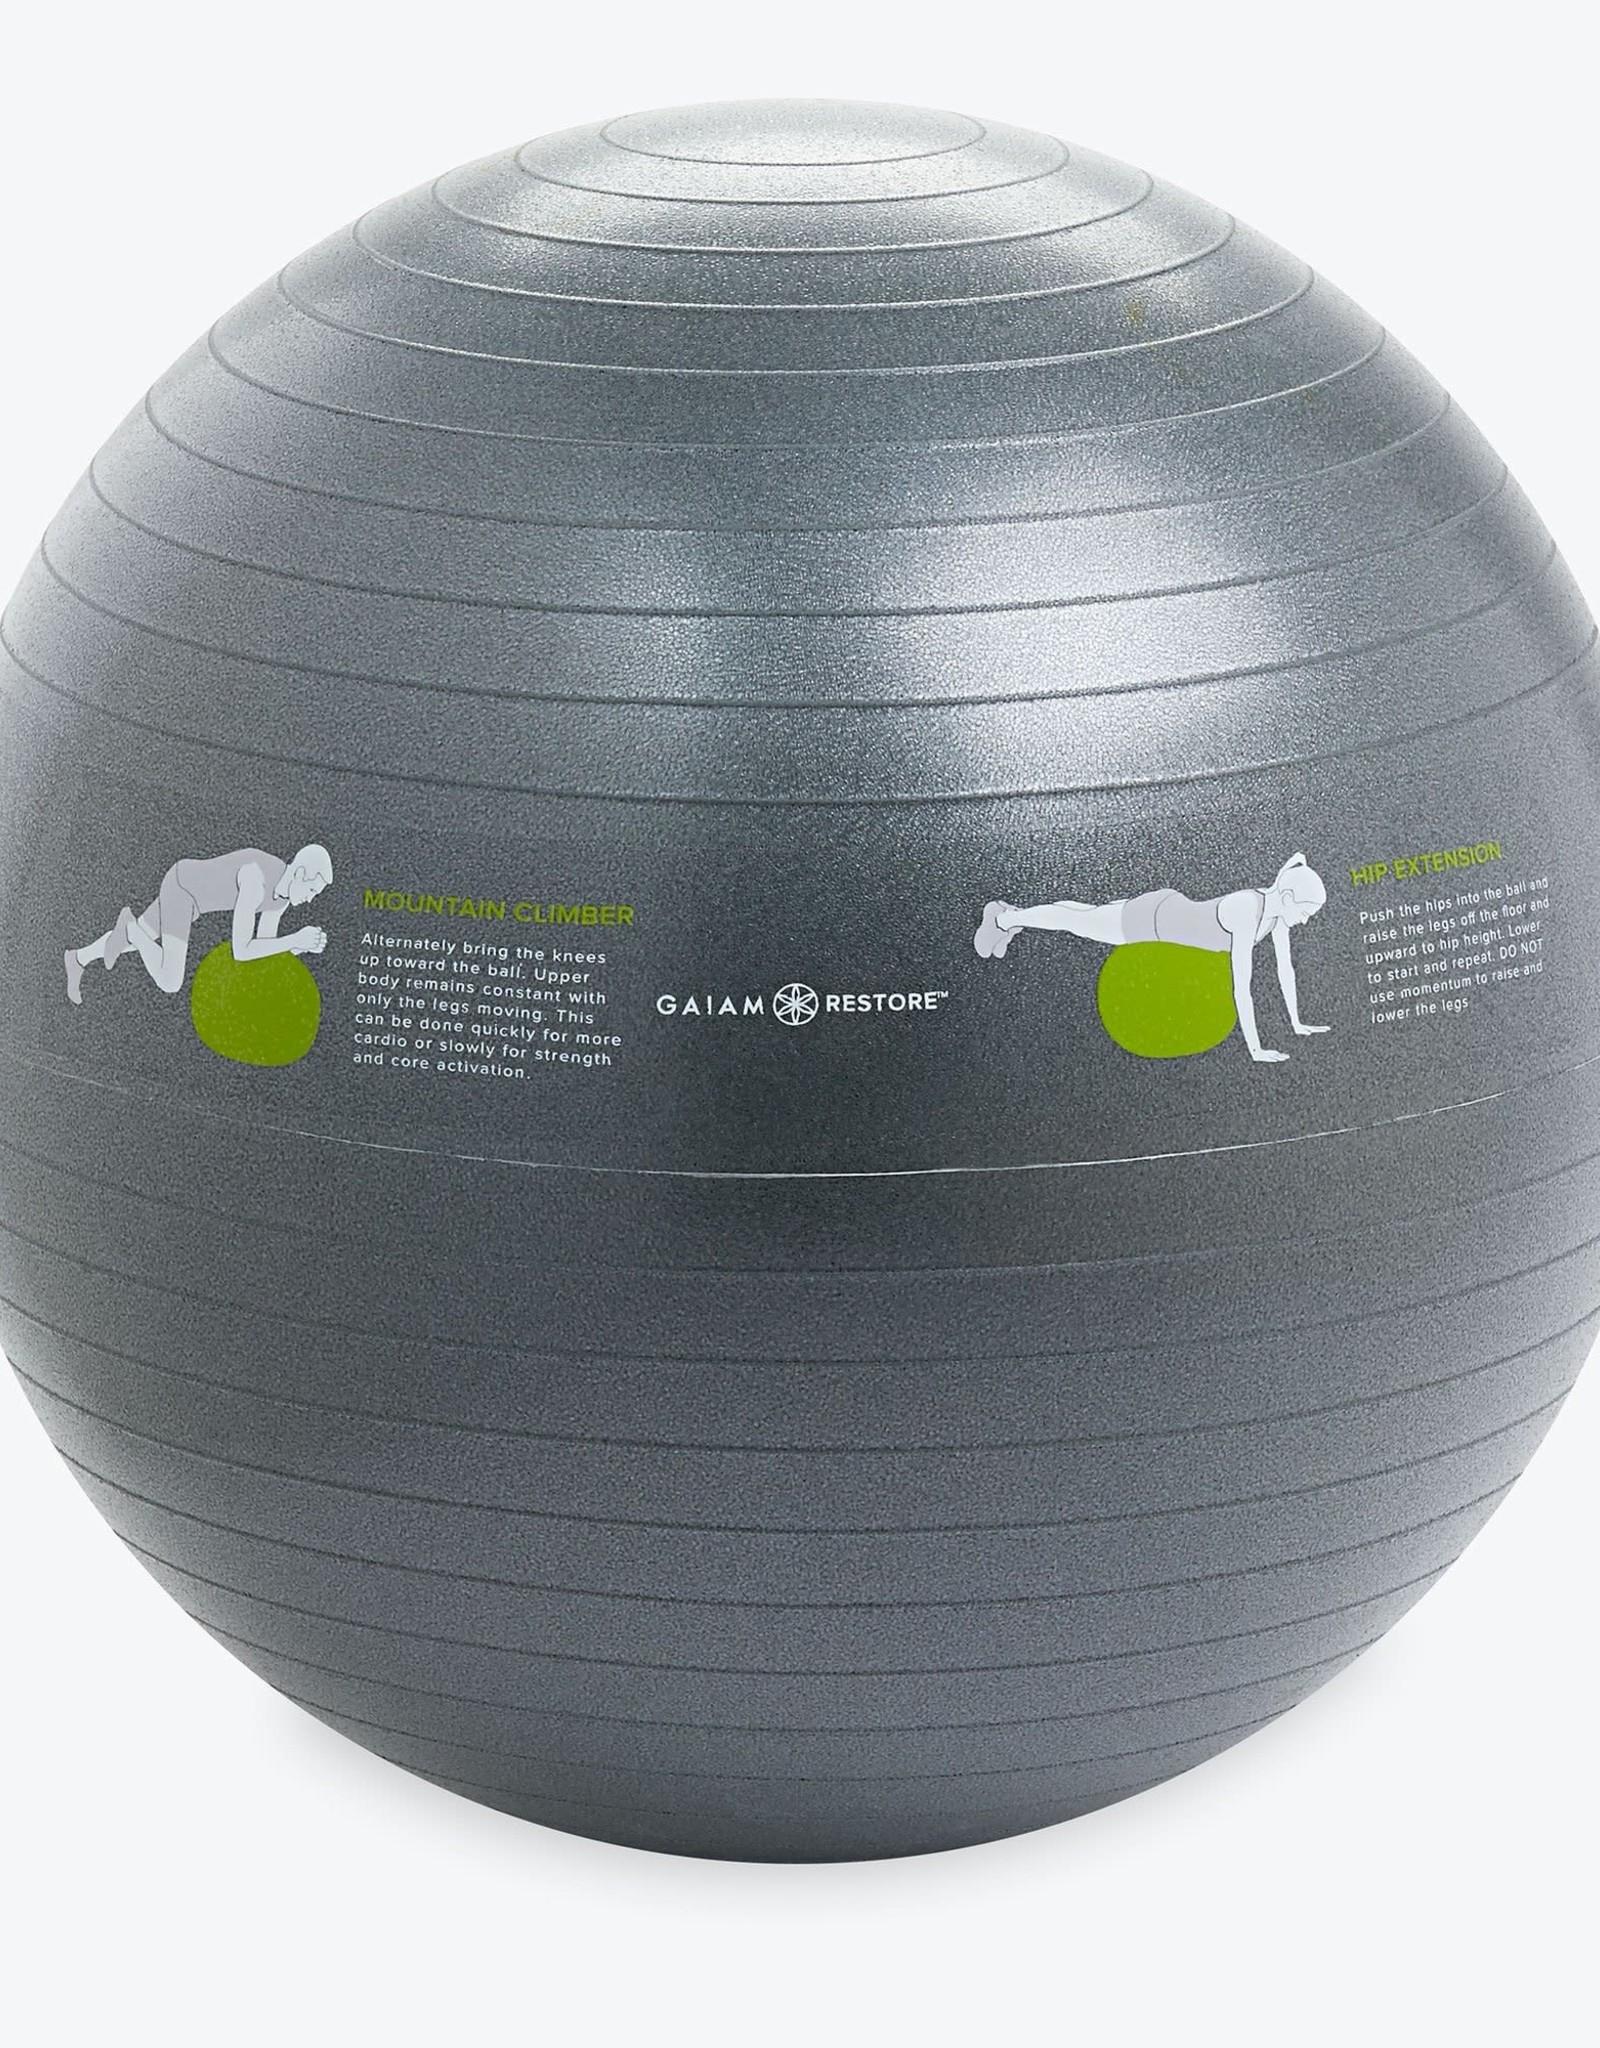 Gaiam Restore Self-Guided Stability Ball